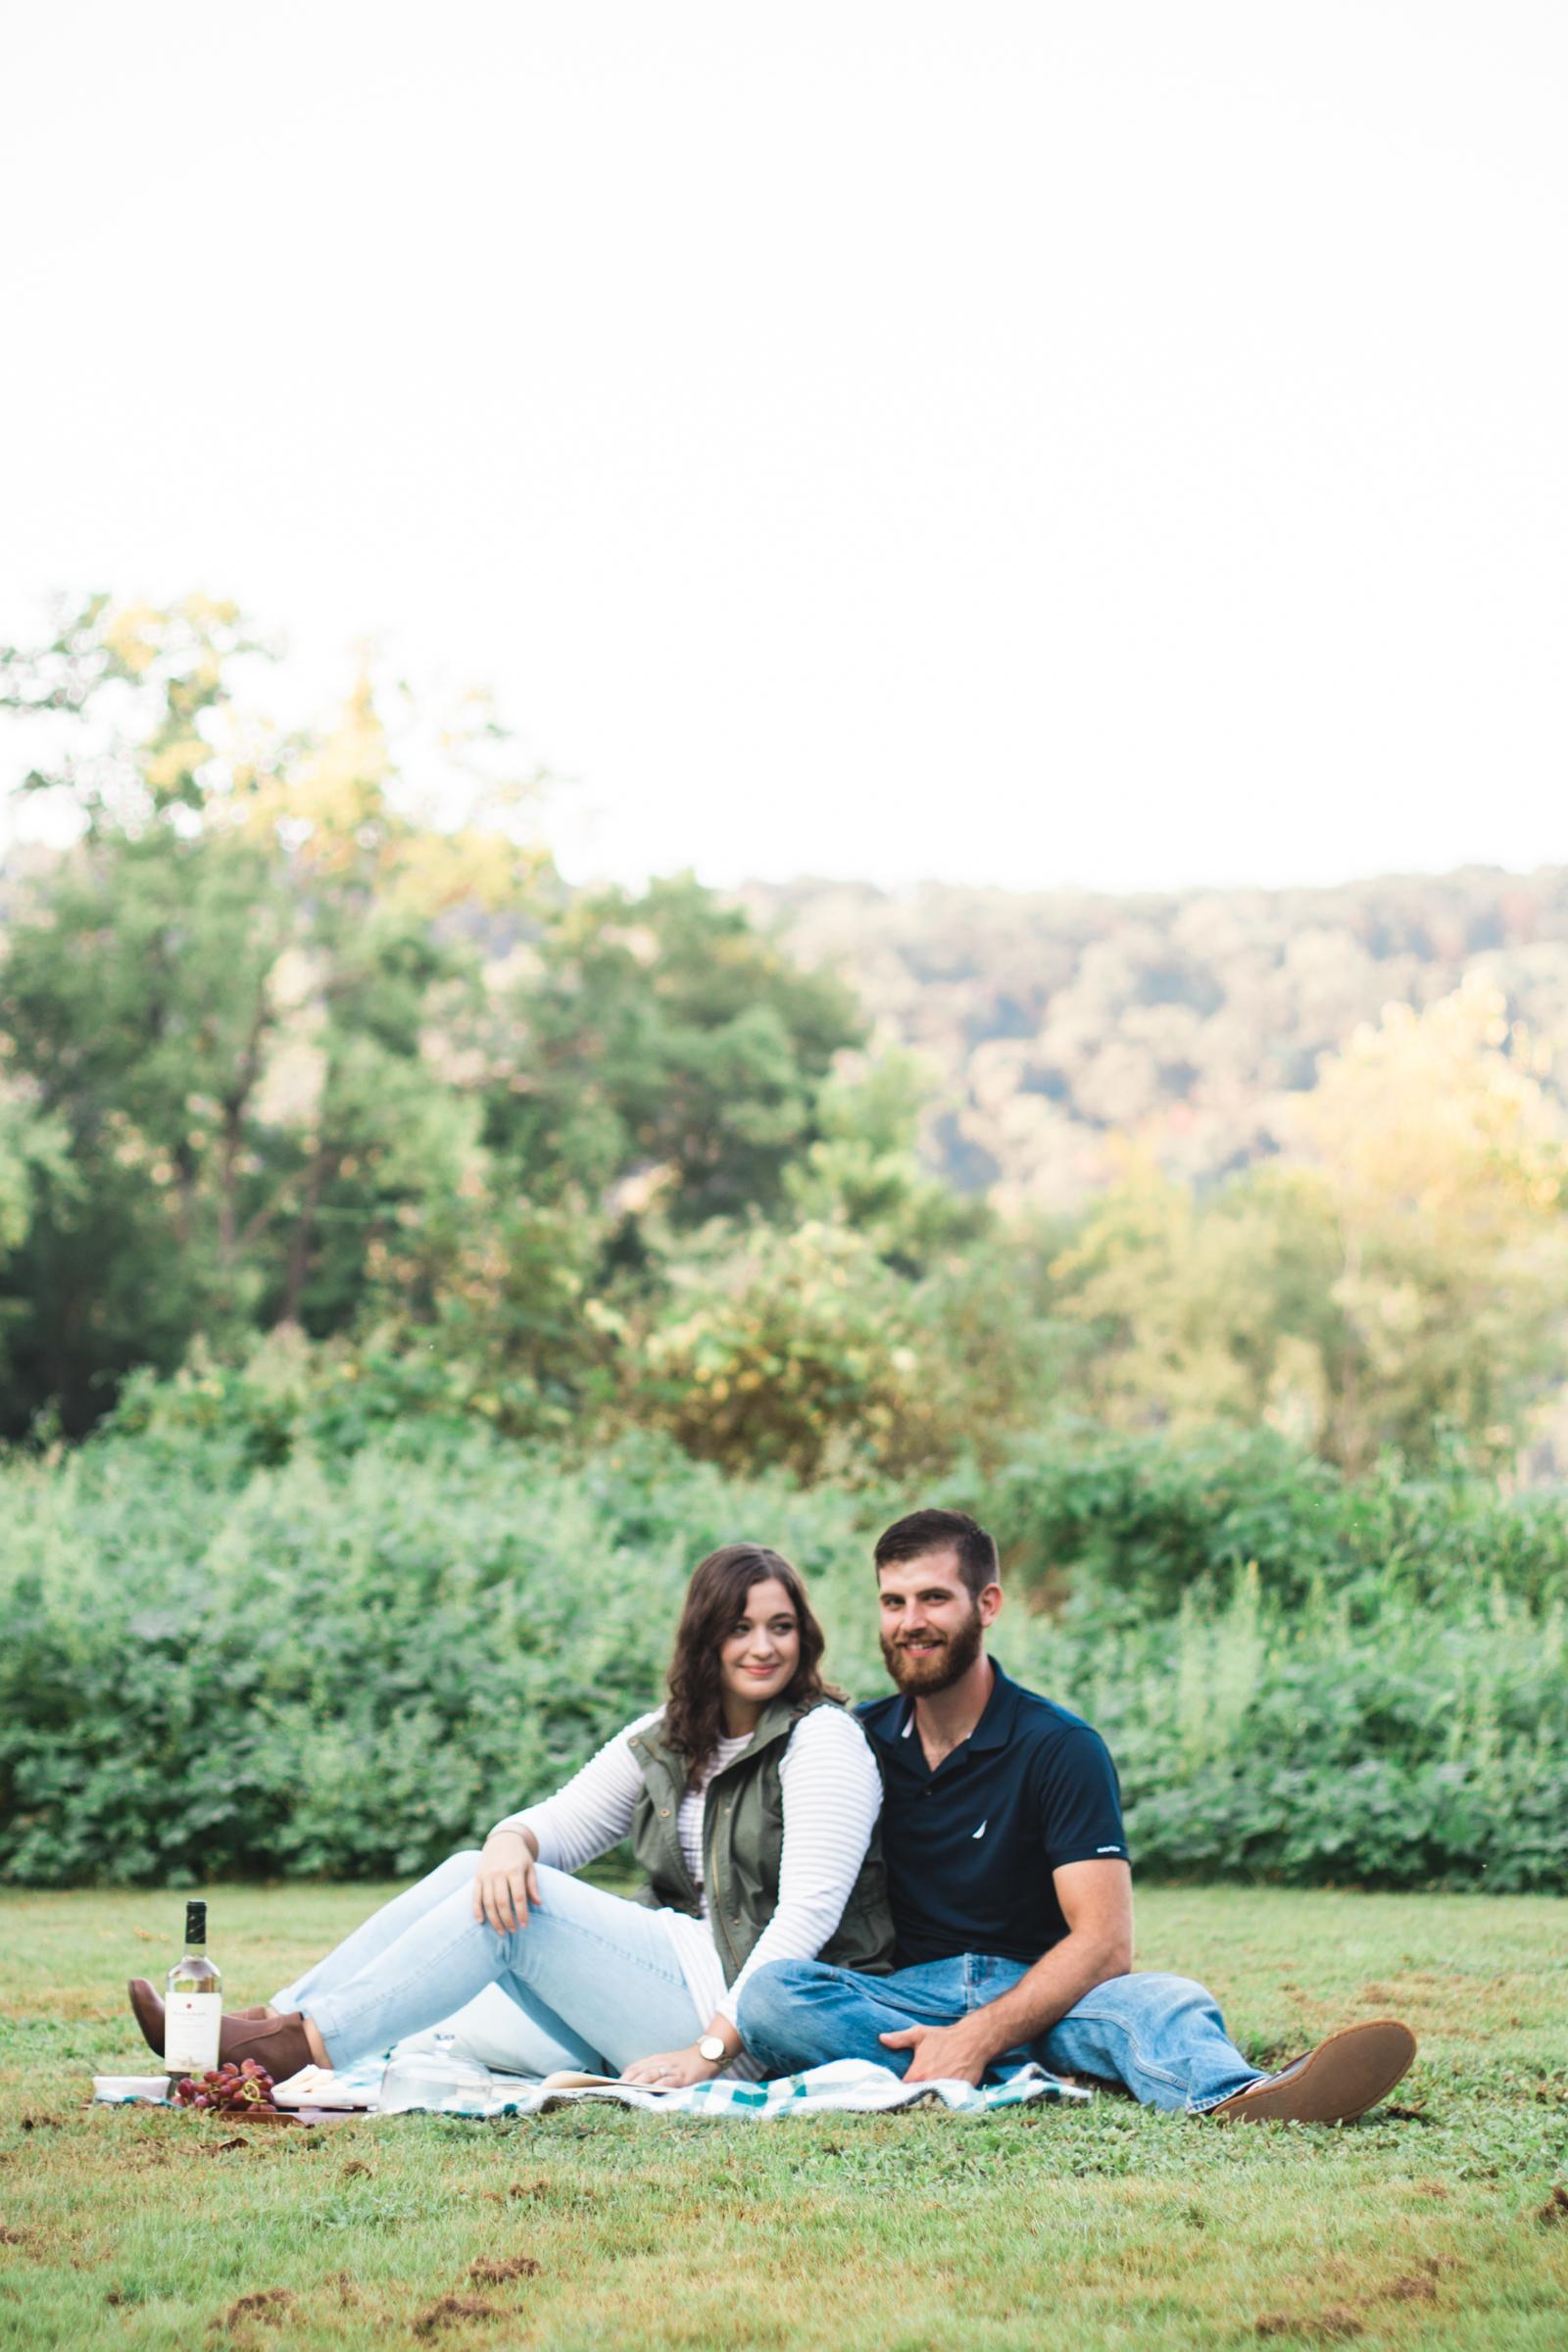 Three Years | Fall Couple Anniversary Photos by Savannah Smith Photography